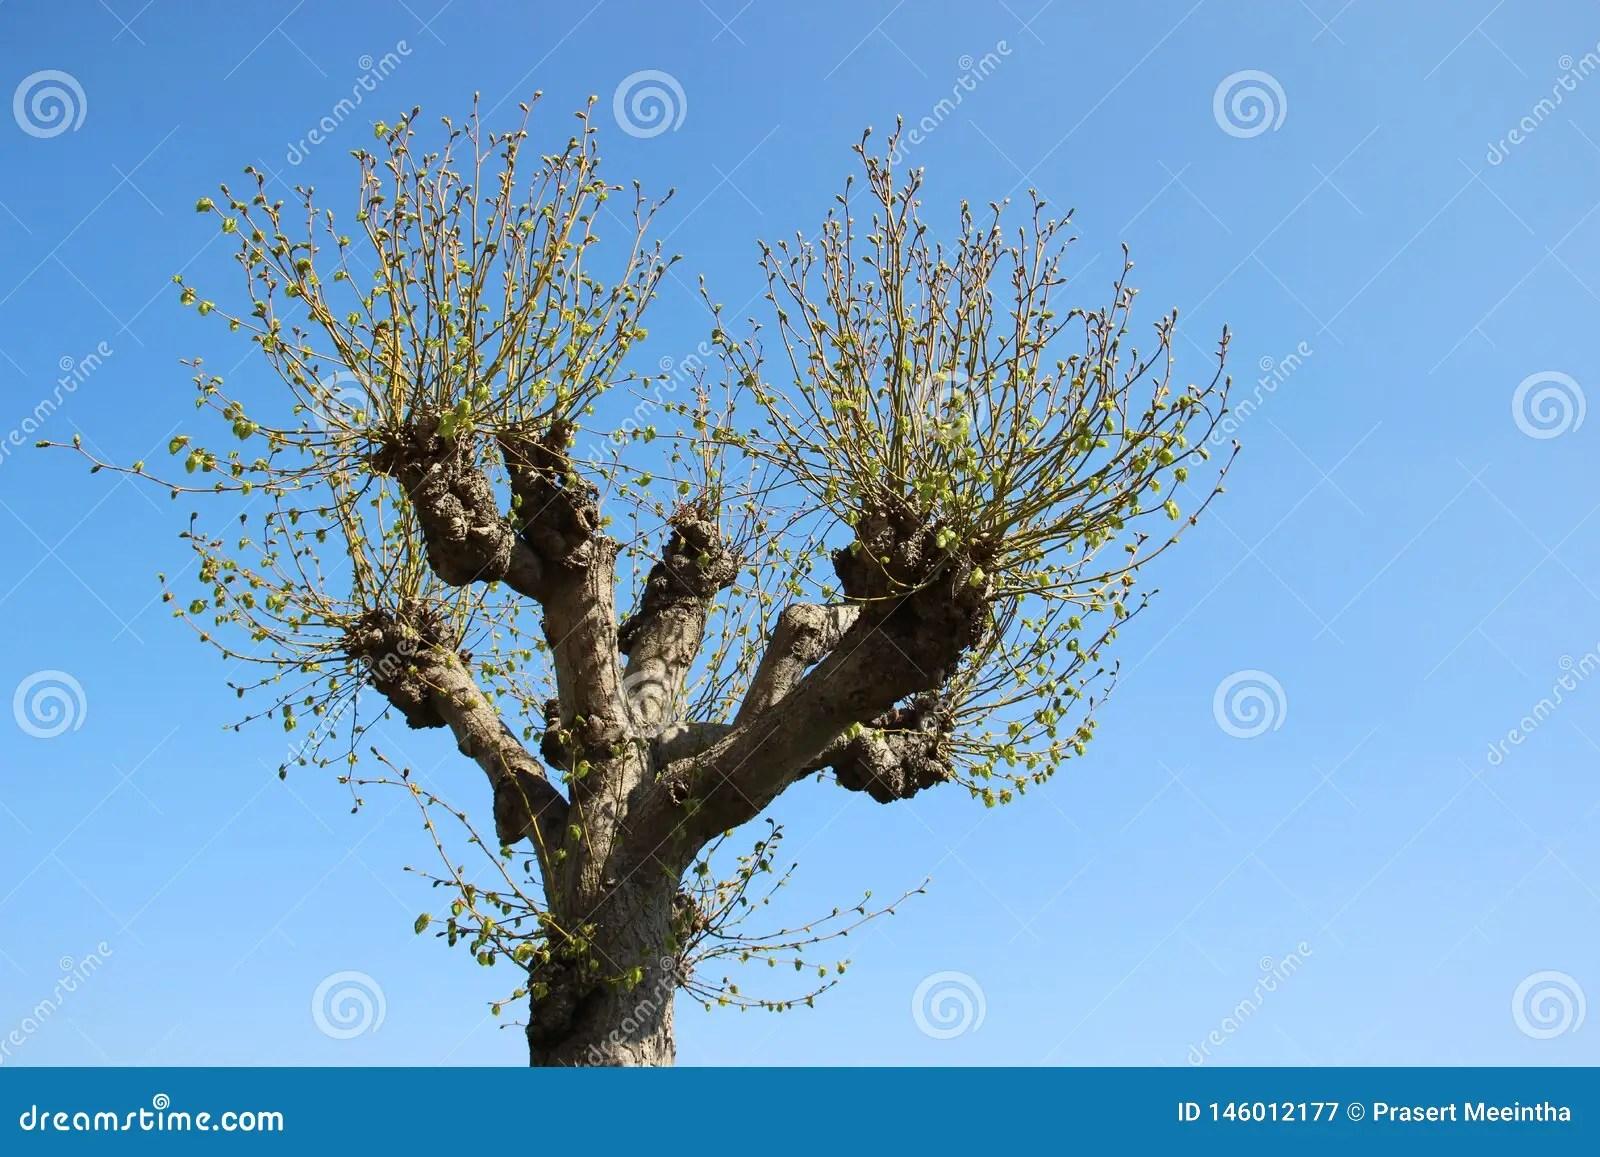 Season Change Tree Budding Leaves In Spring Stock Image